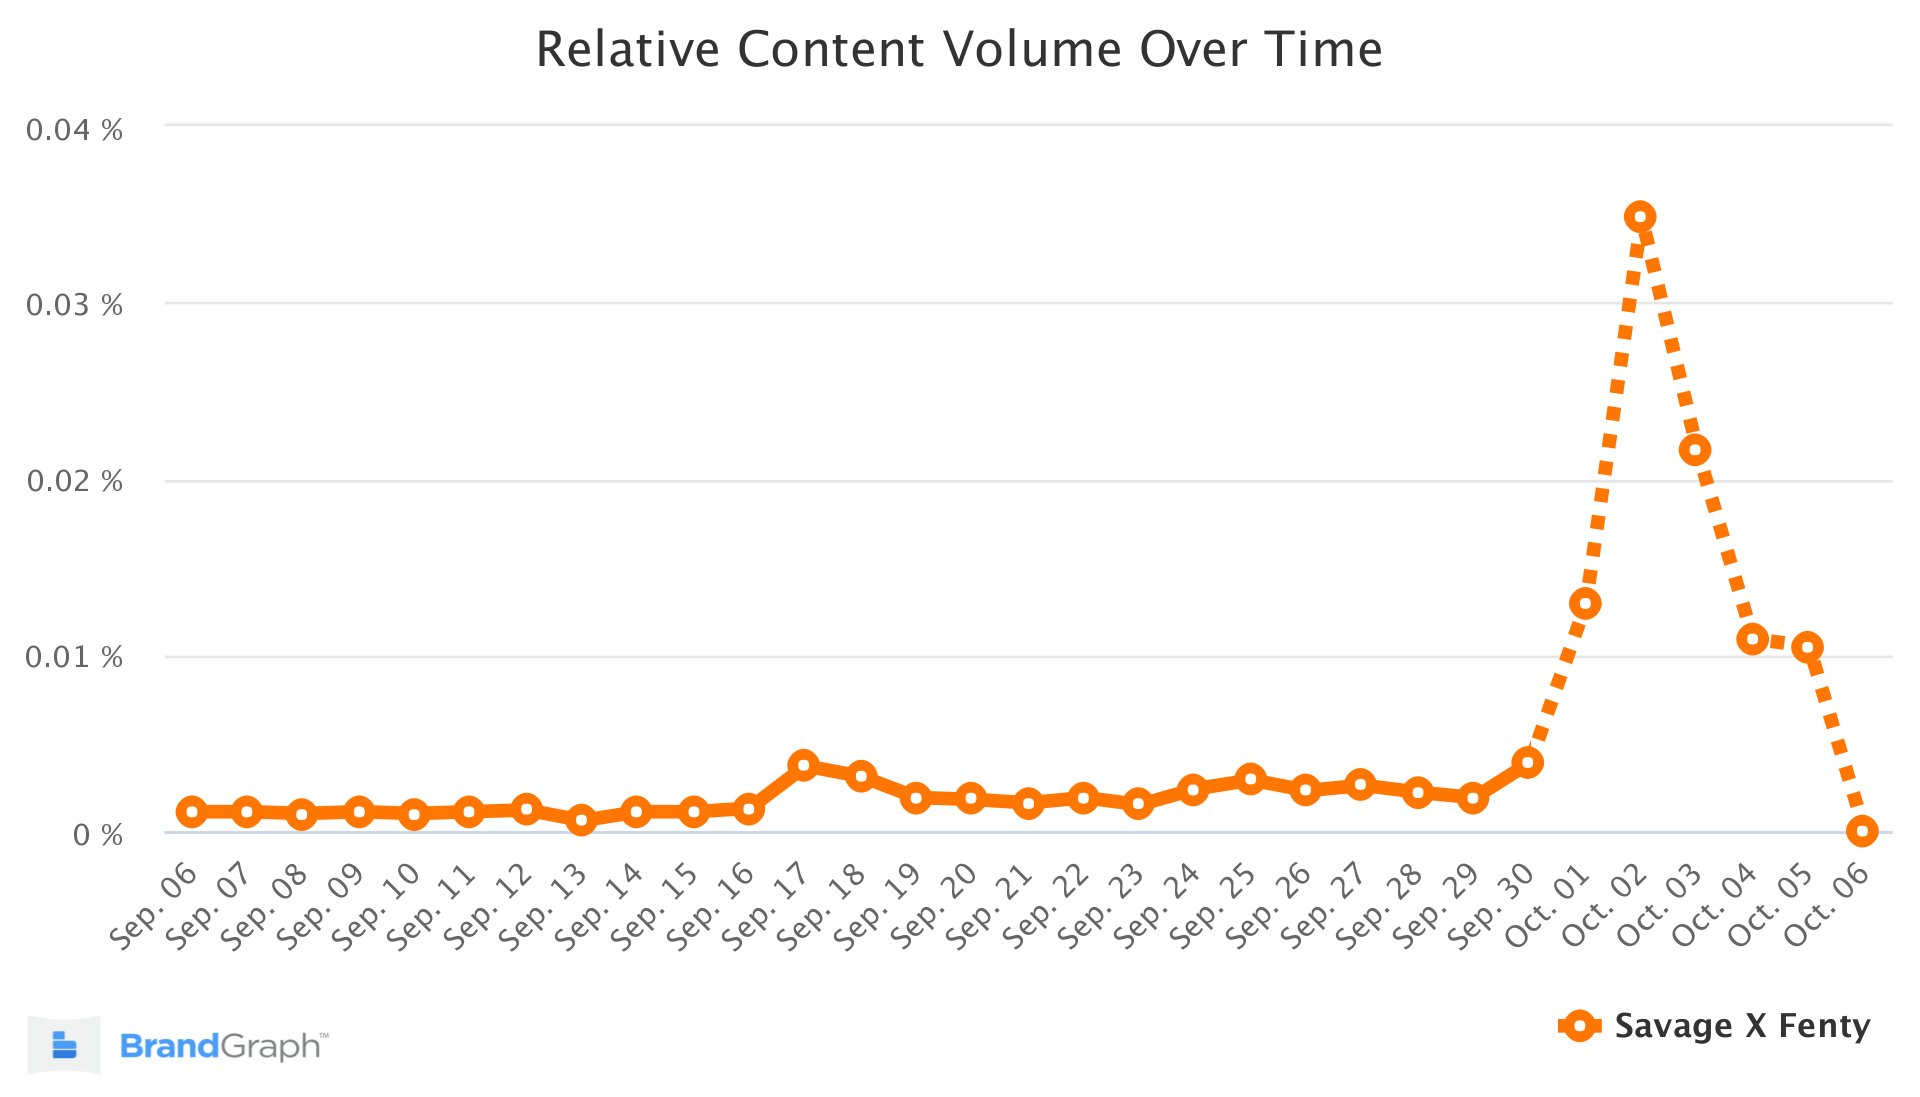 Savage X Fenty BrandGraph Chart